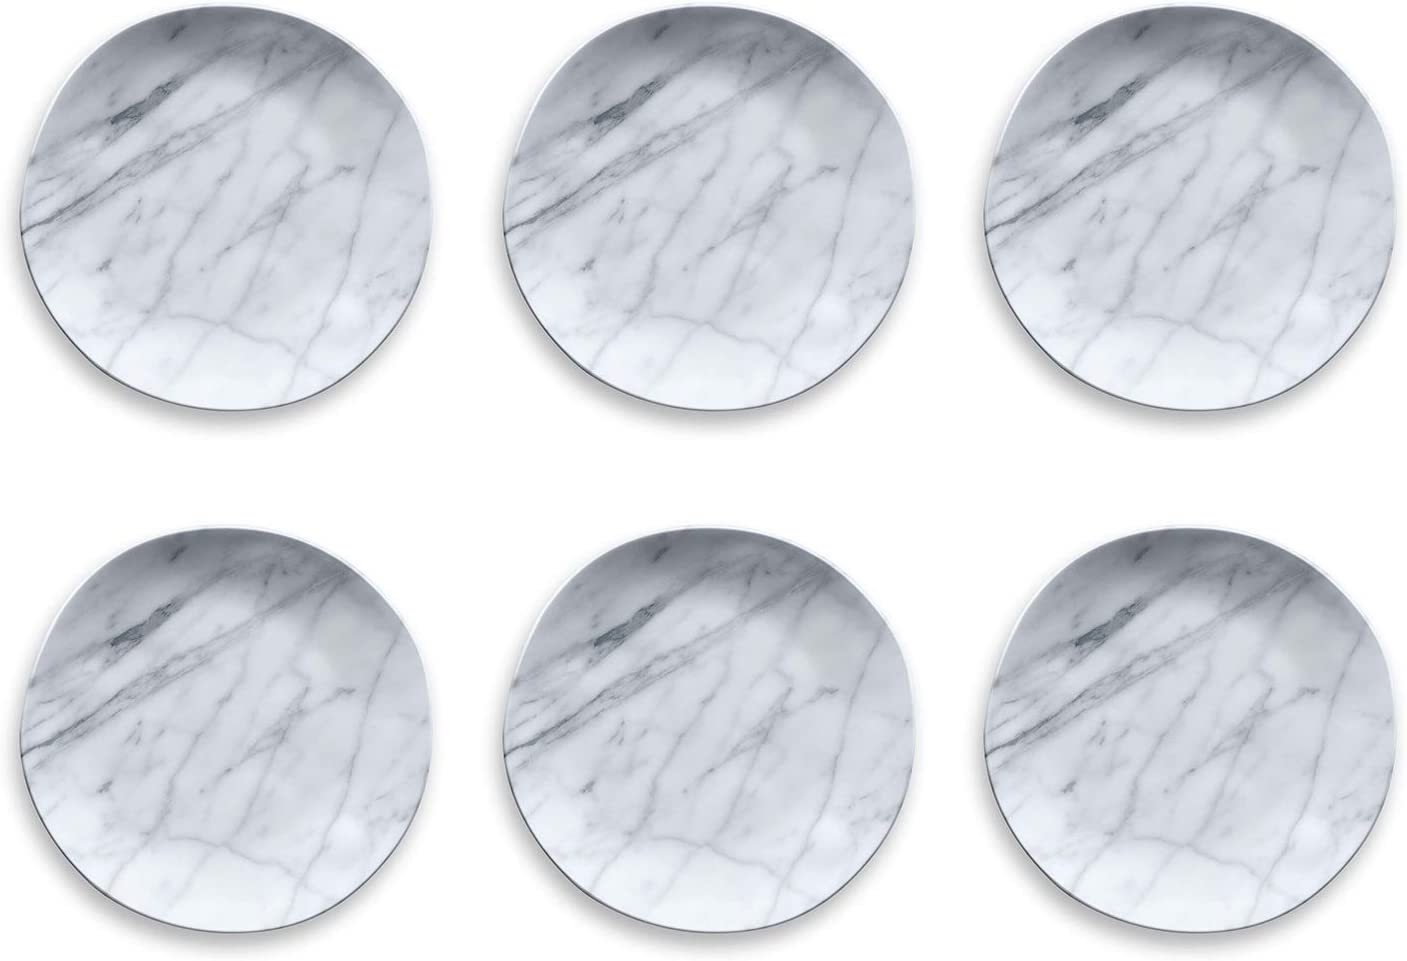 "PON1105TDCM - Set of 6 - Carrara Marble - Melamine Dinner Plate - 10.5"" by TarHong"